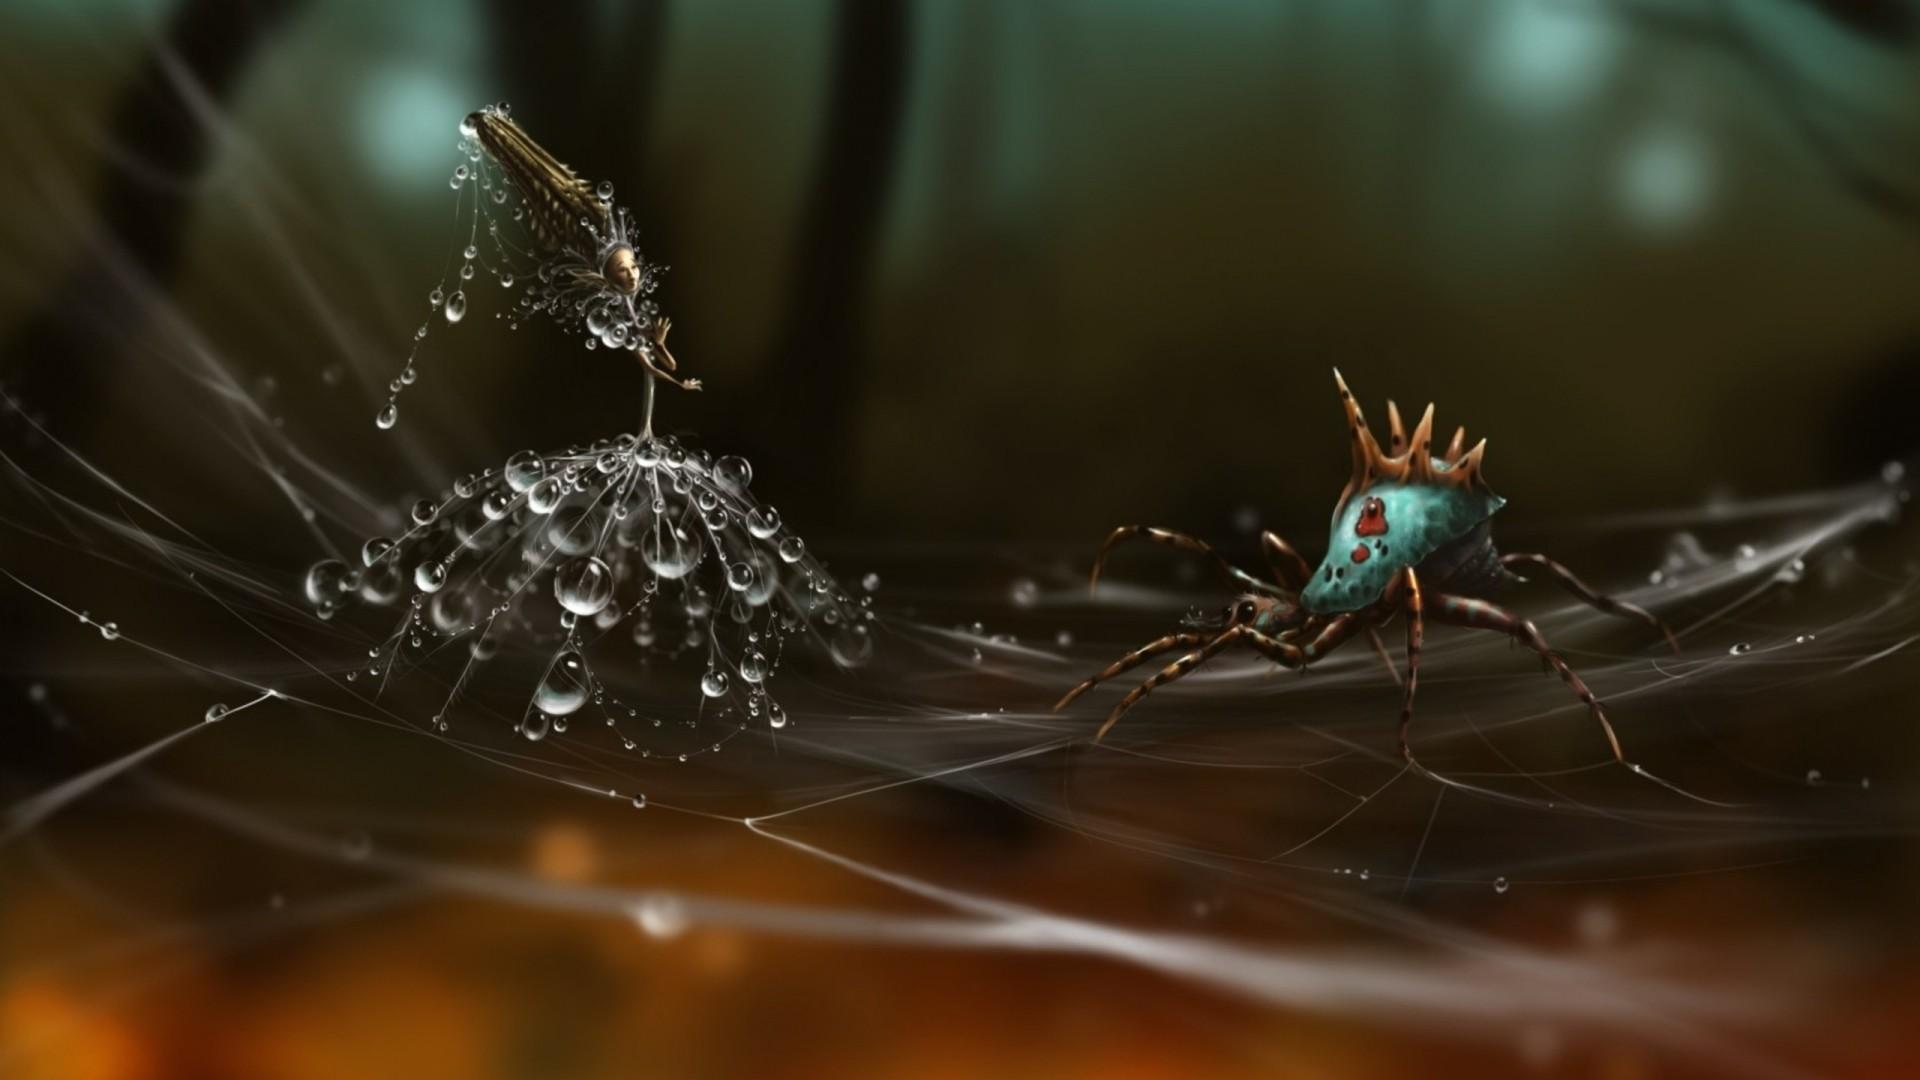 Wallpaper spider, web, dandelion seeds